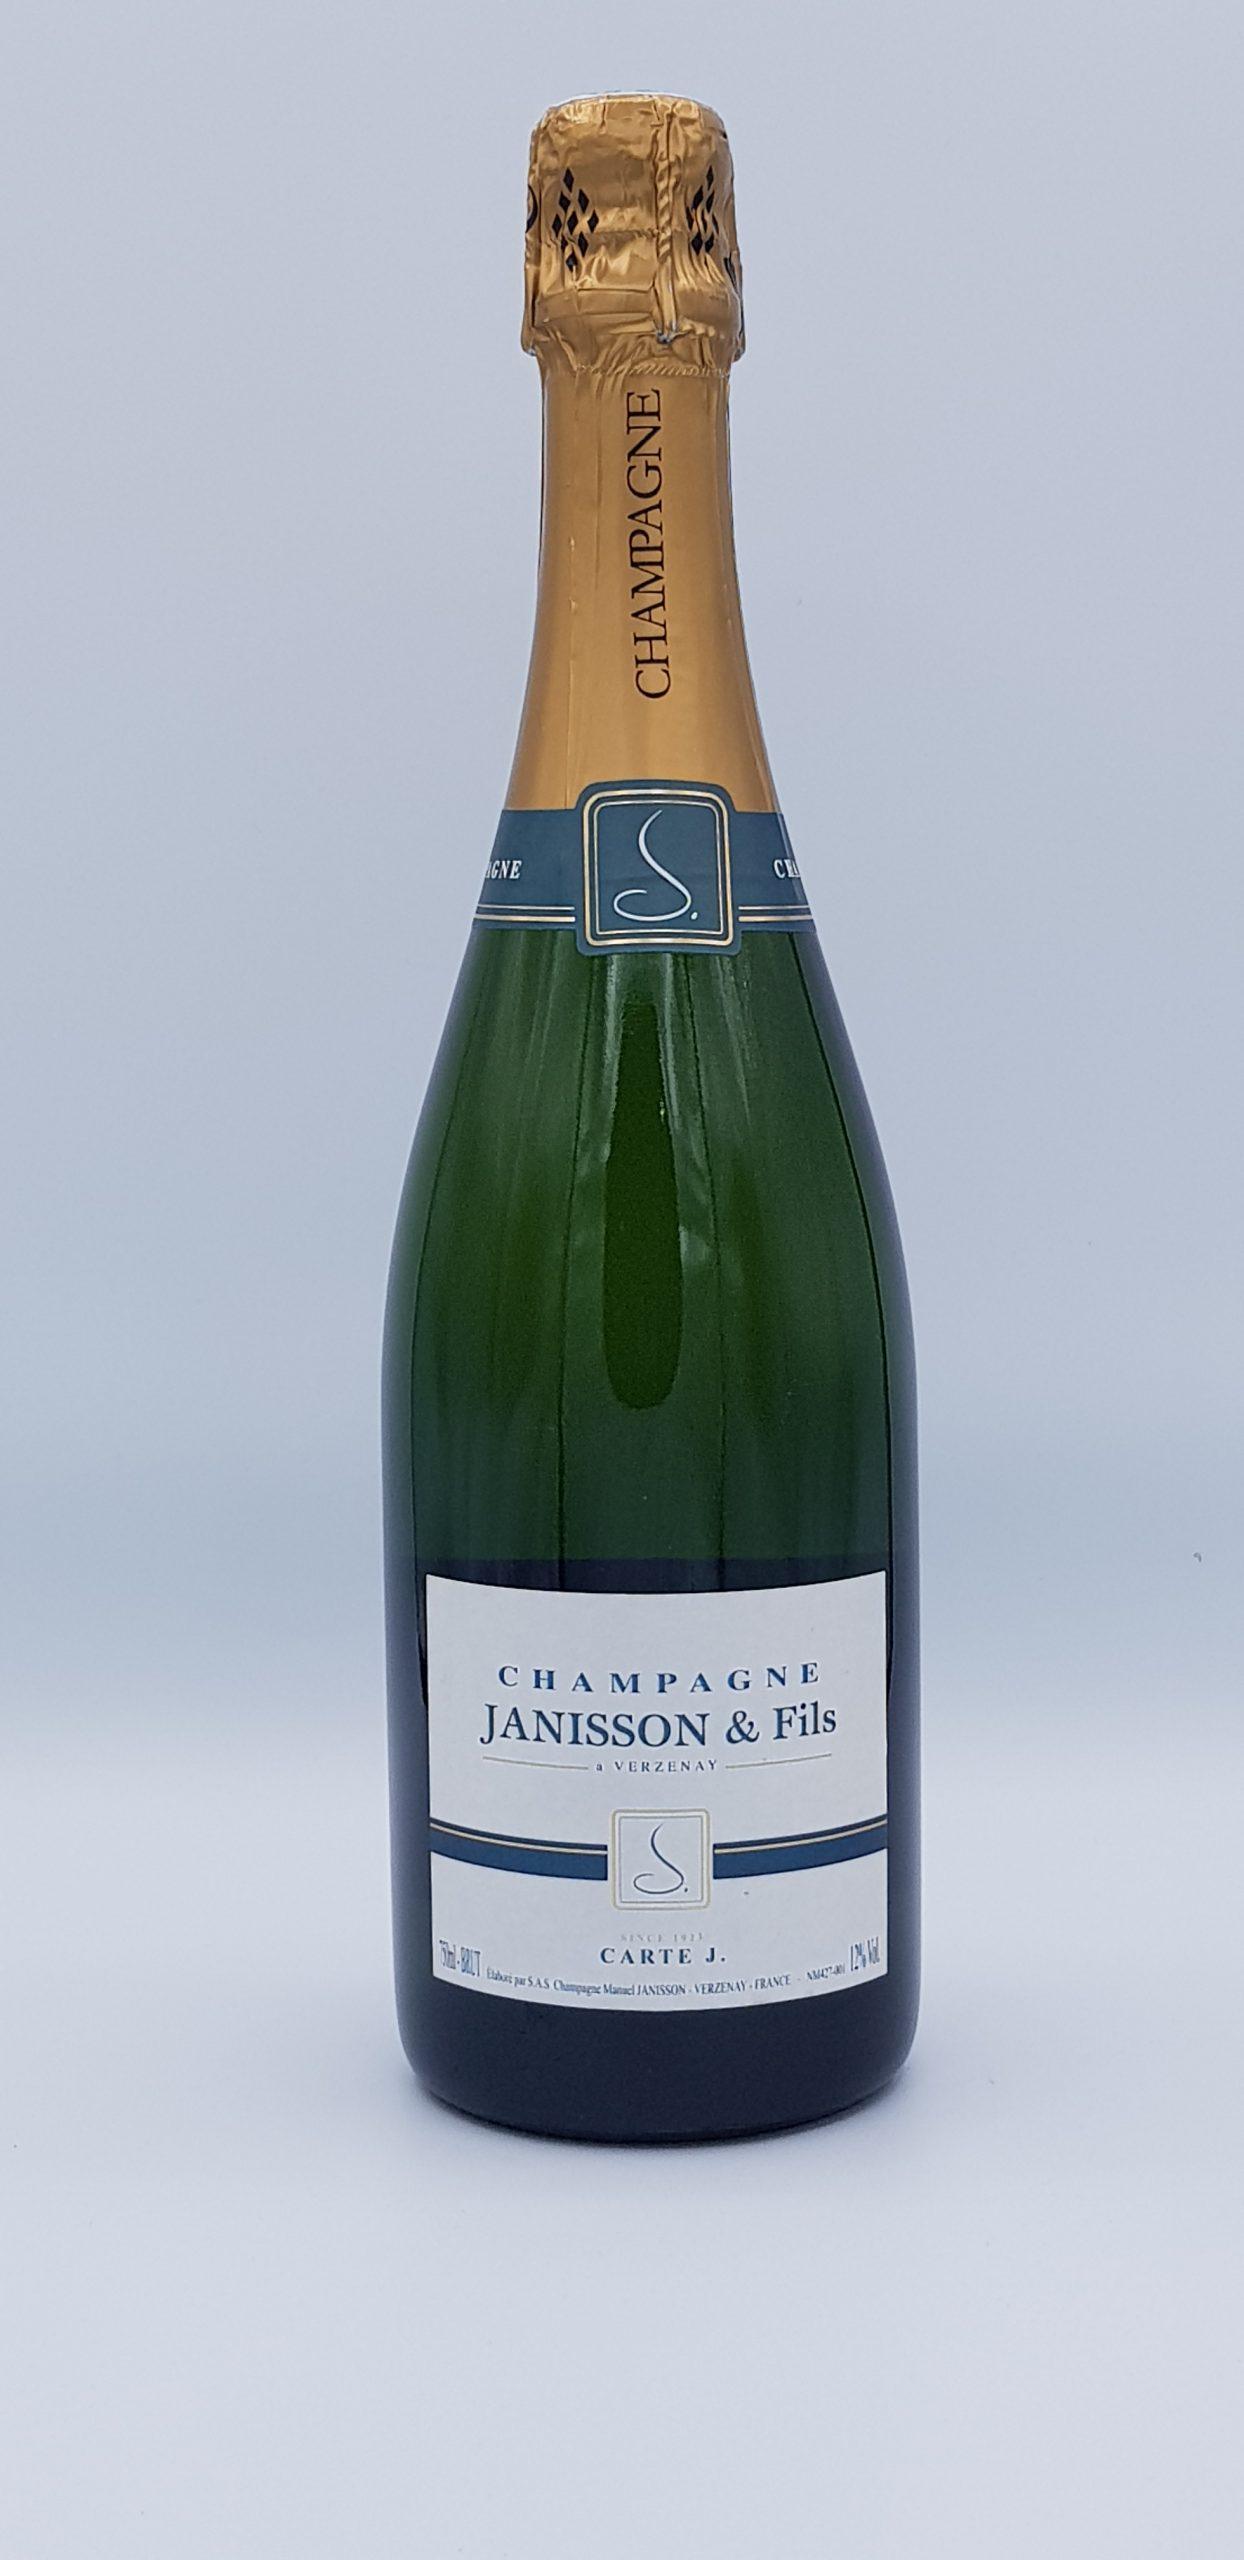 Champagne Janisson Carte J